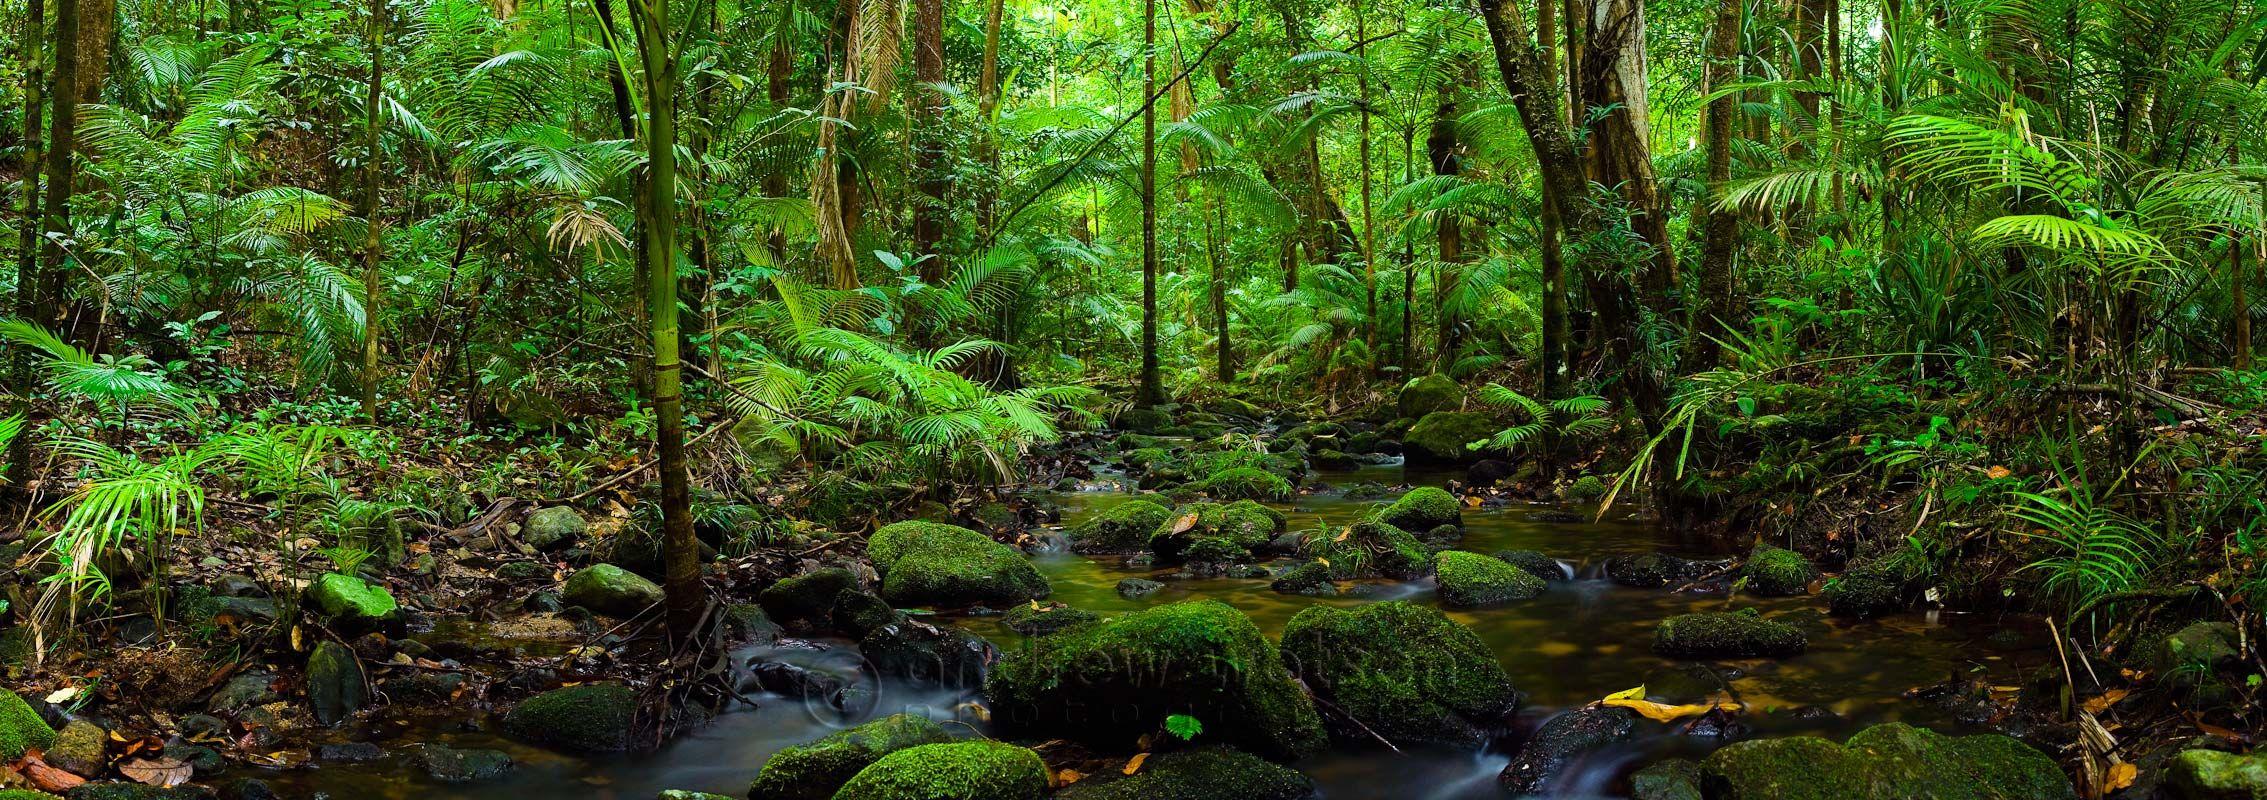 Dantree rainforest queensland australia conquering the for Australian rainforest